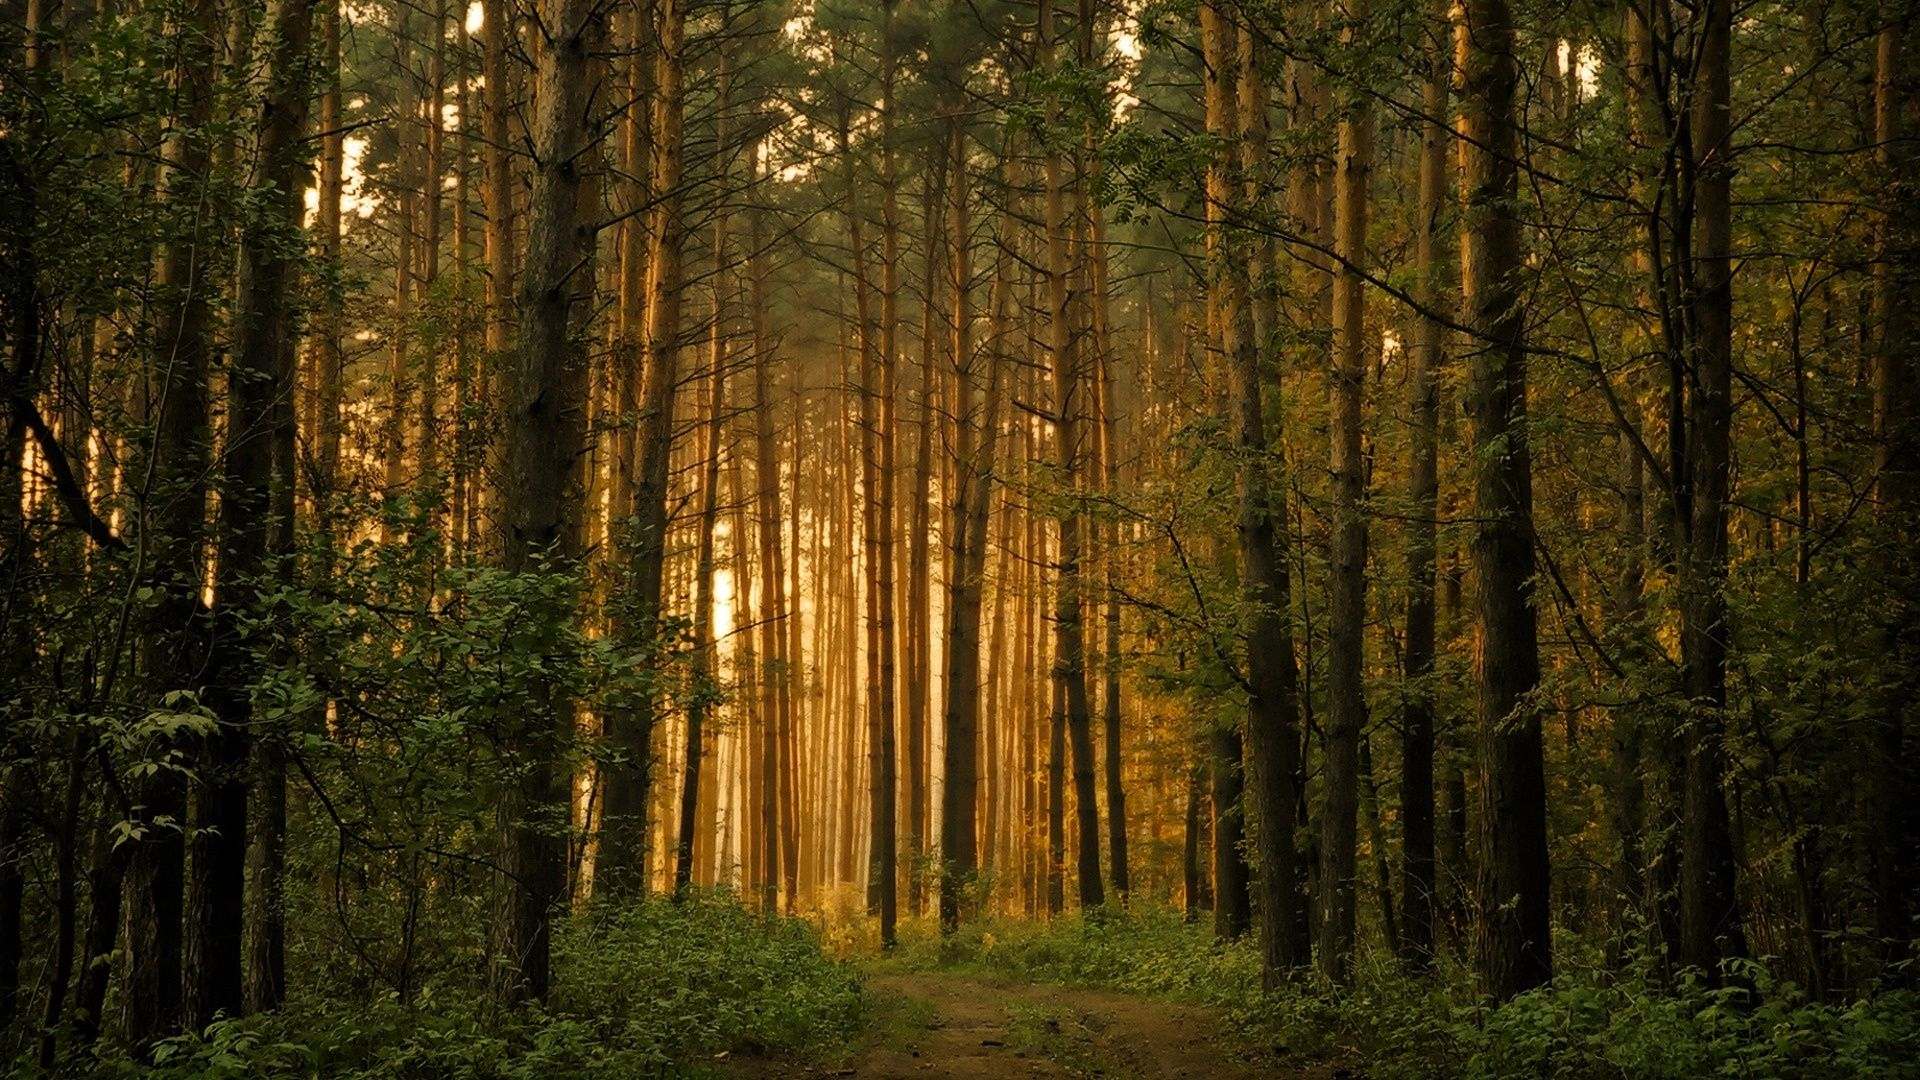 Trees Forest desktop wallpaper download